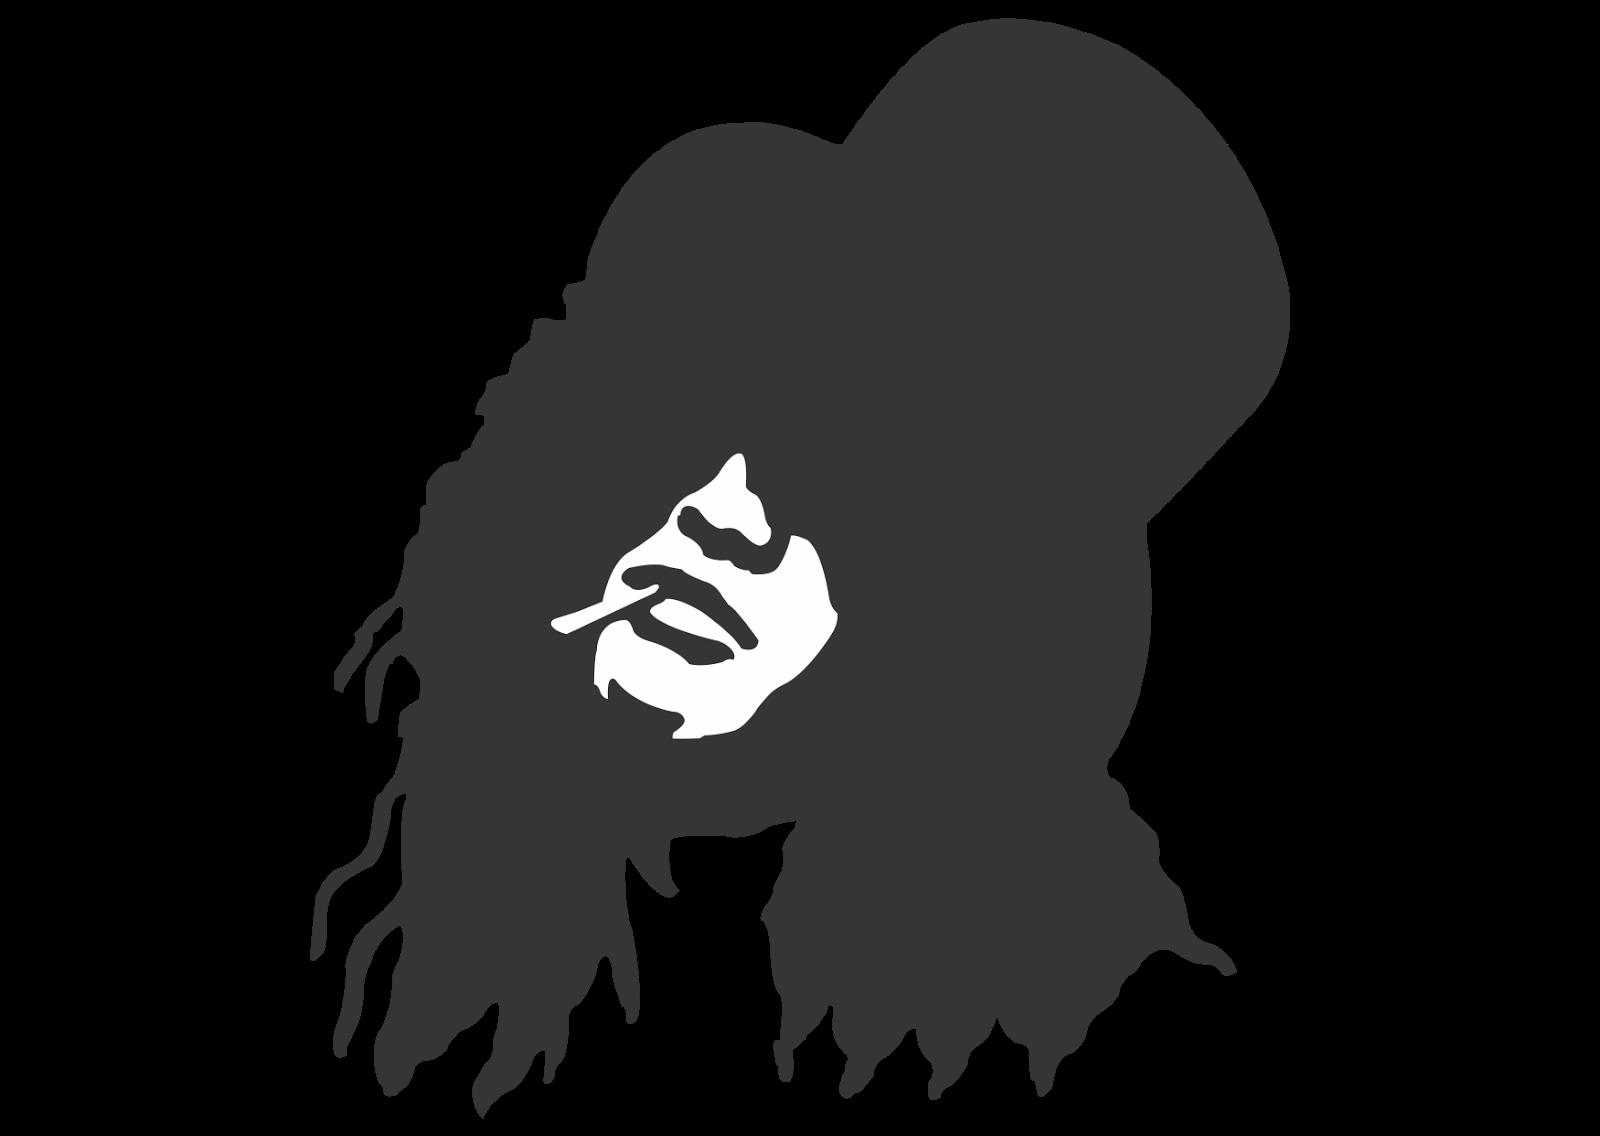 Guns n roses Slash Logo Vector ~ Format Cdr, Ai, Eps, Svg ... (1600 x 1136 Pixel)